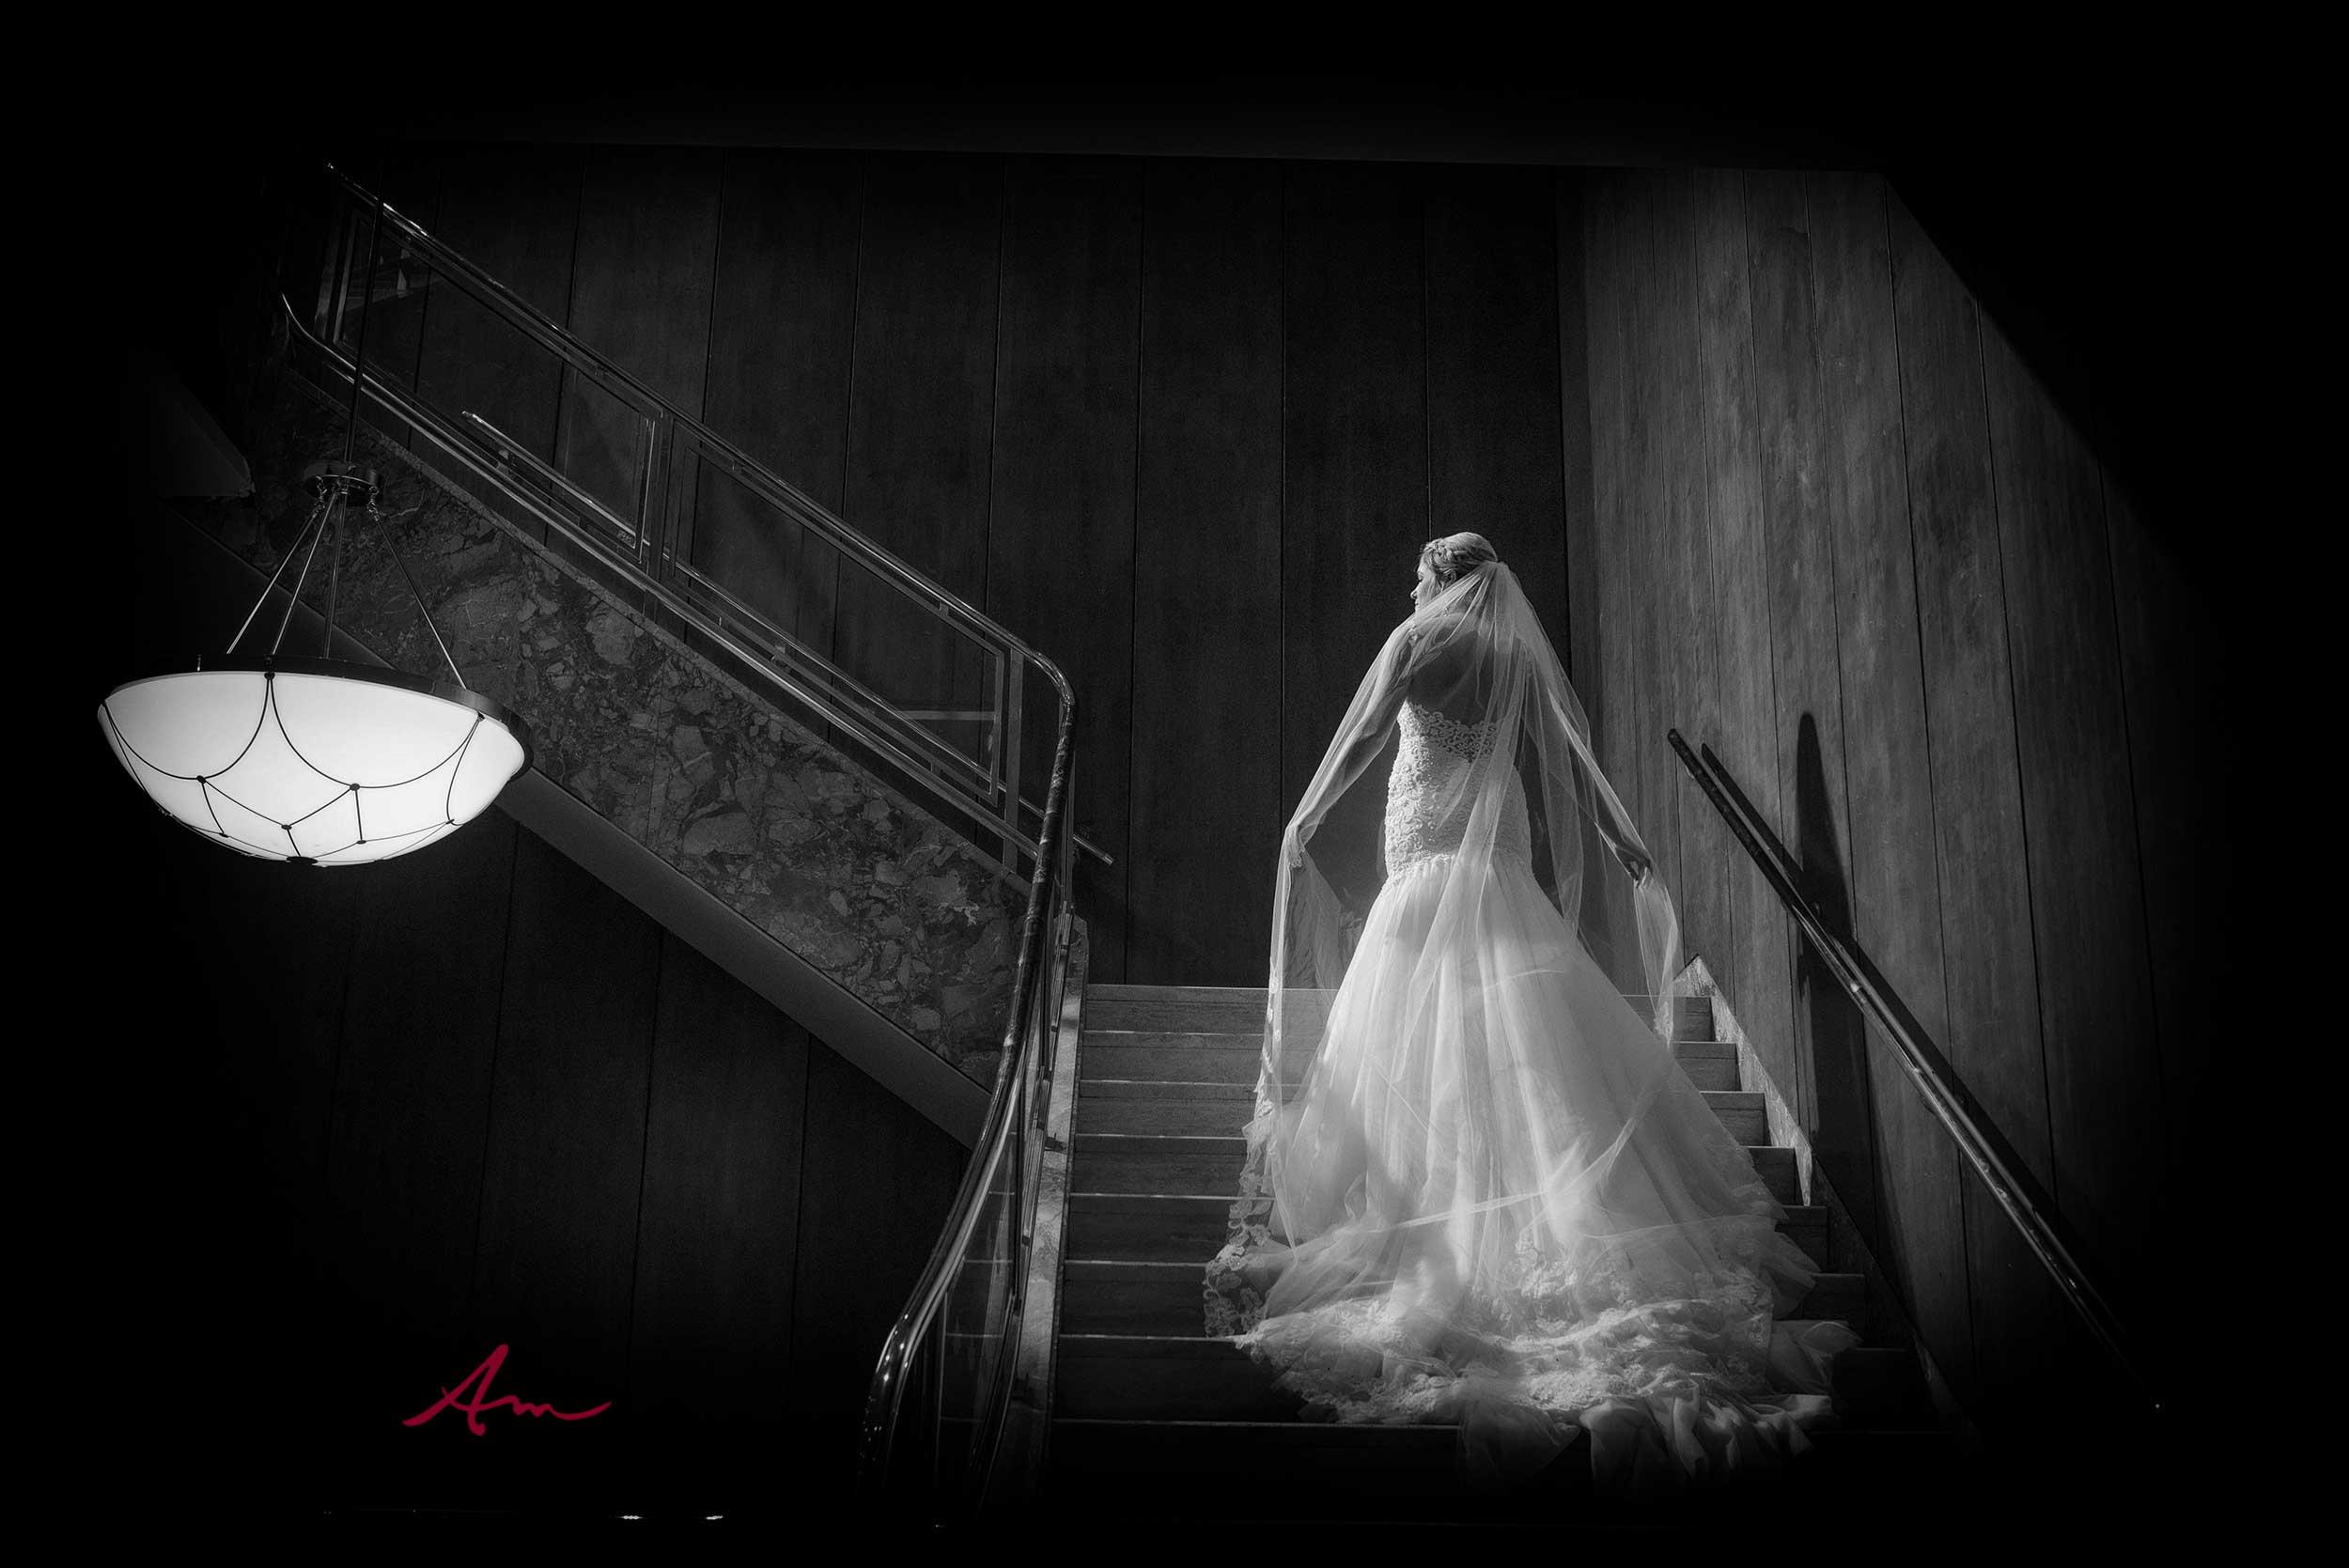 westin-bride-staircase.jpg